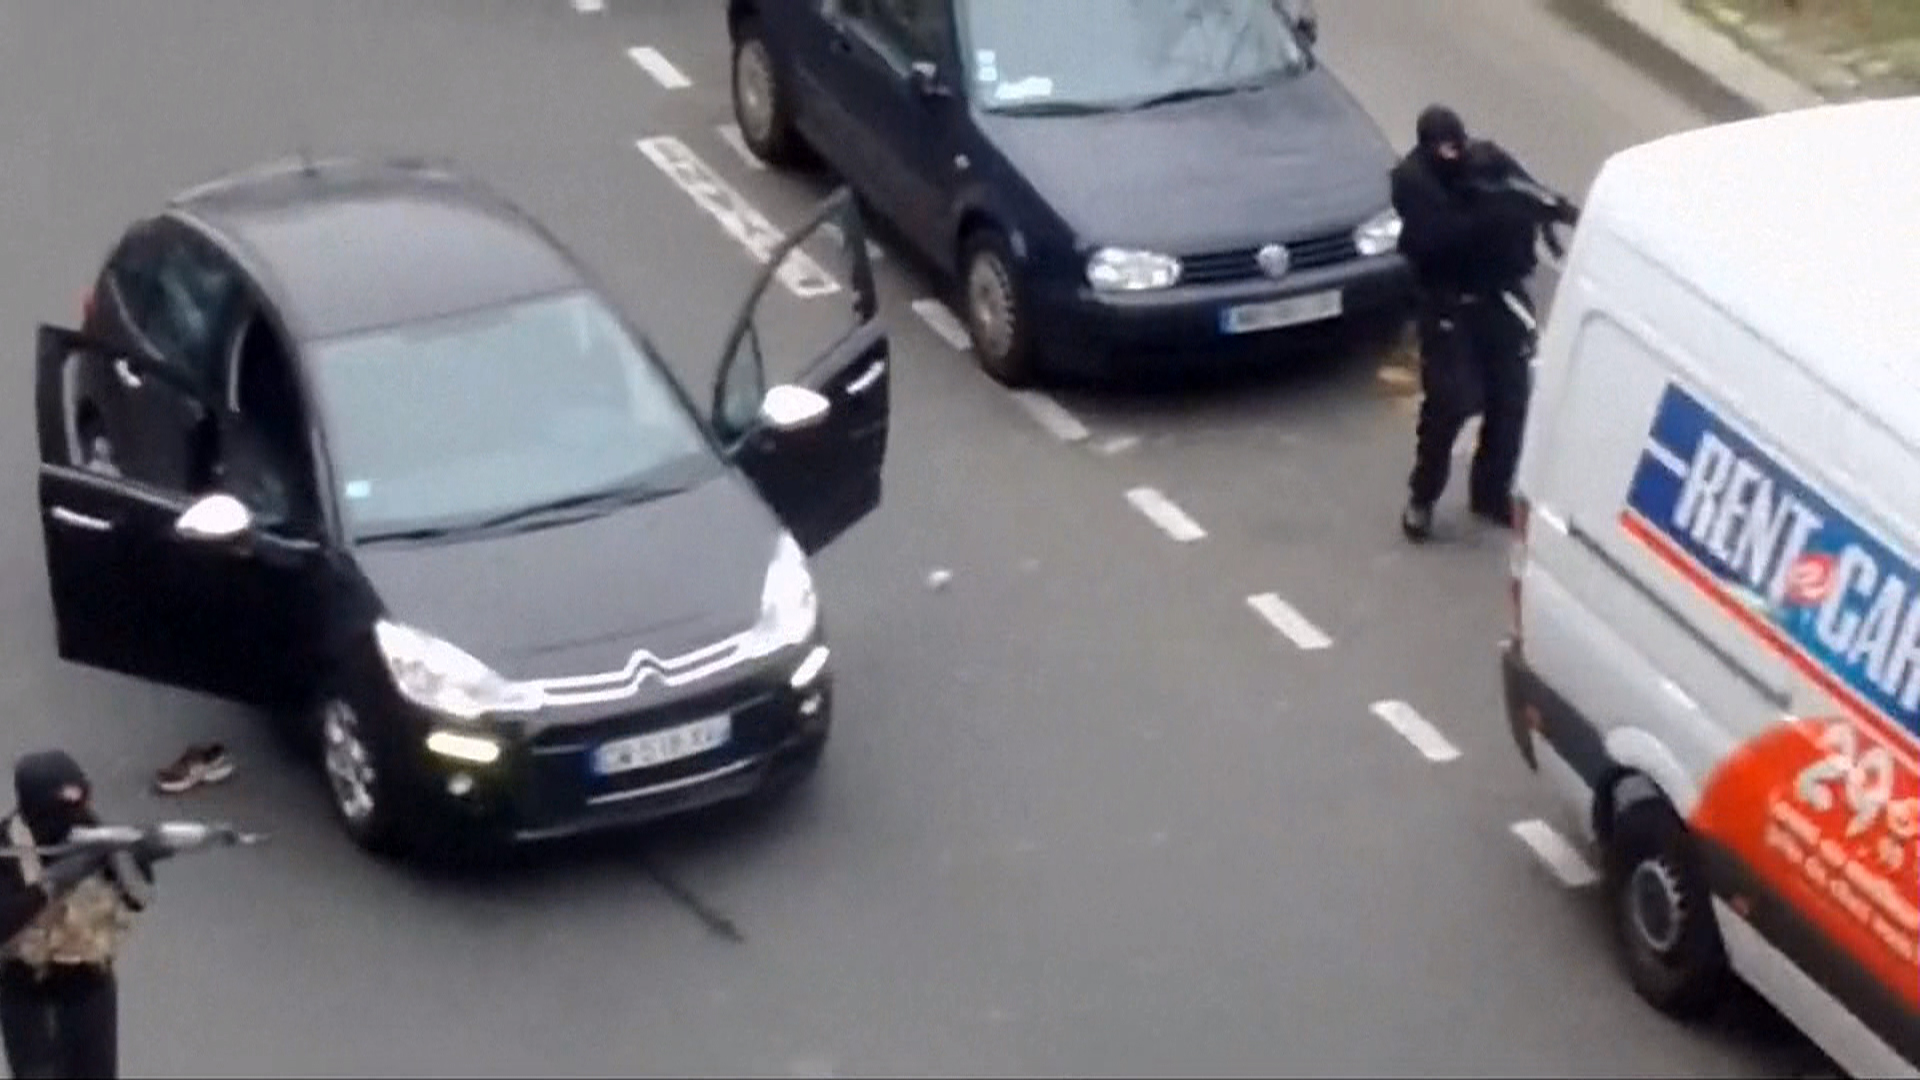 Charlie Hebdo Shooting: 12 Killed at Muhammad Cartoons Magazine in Paris